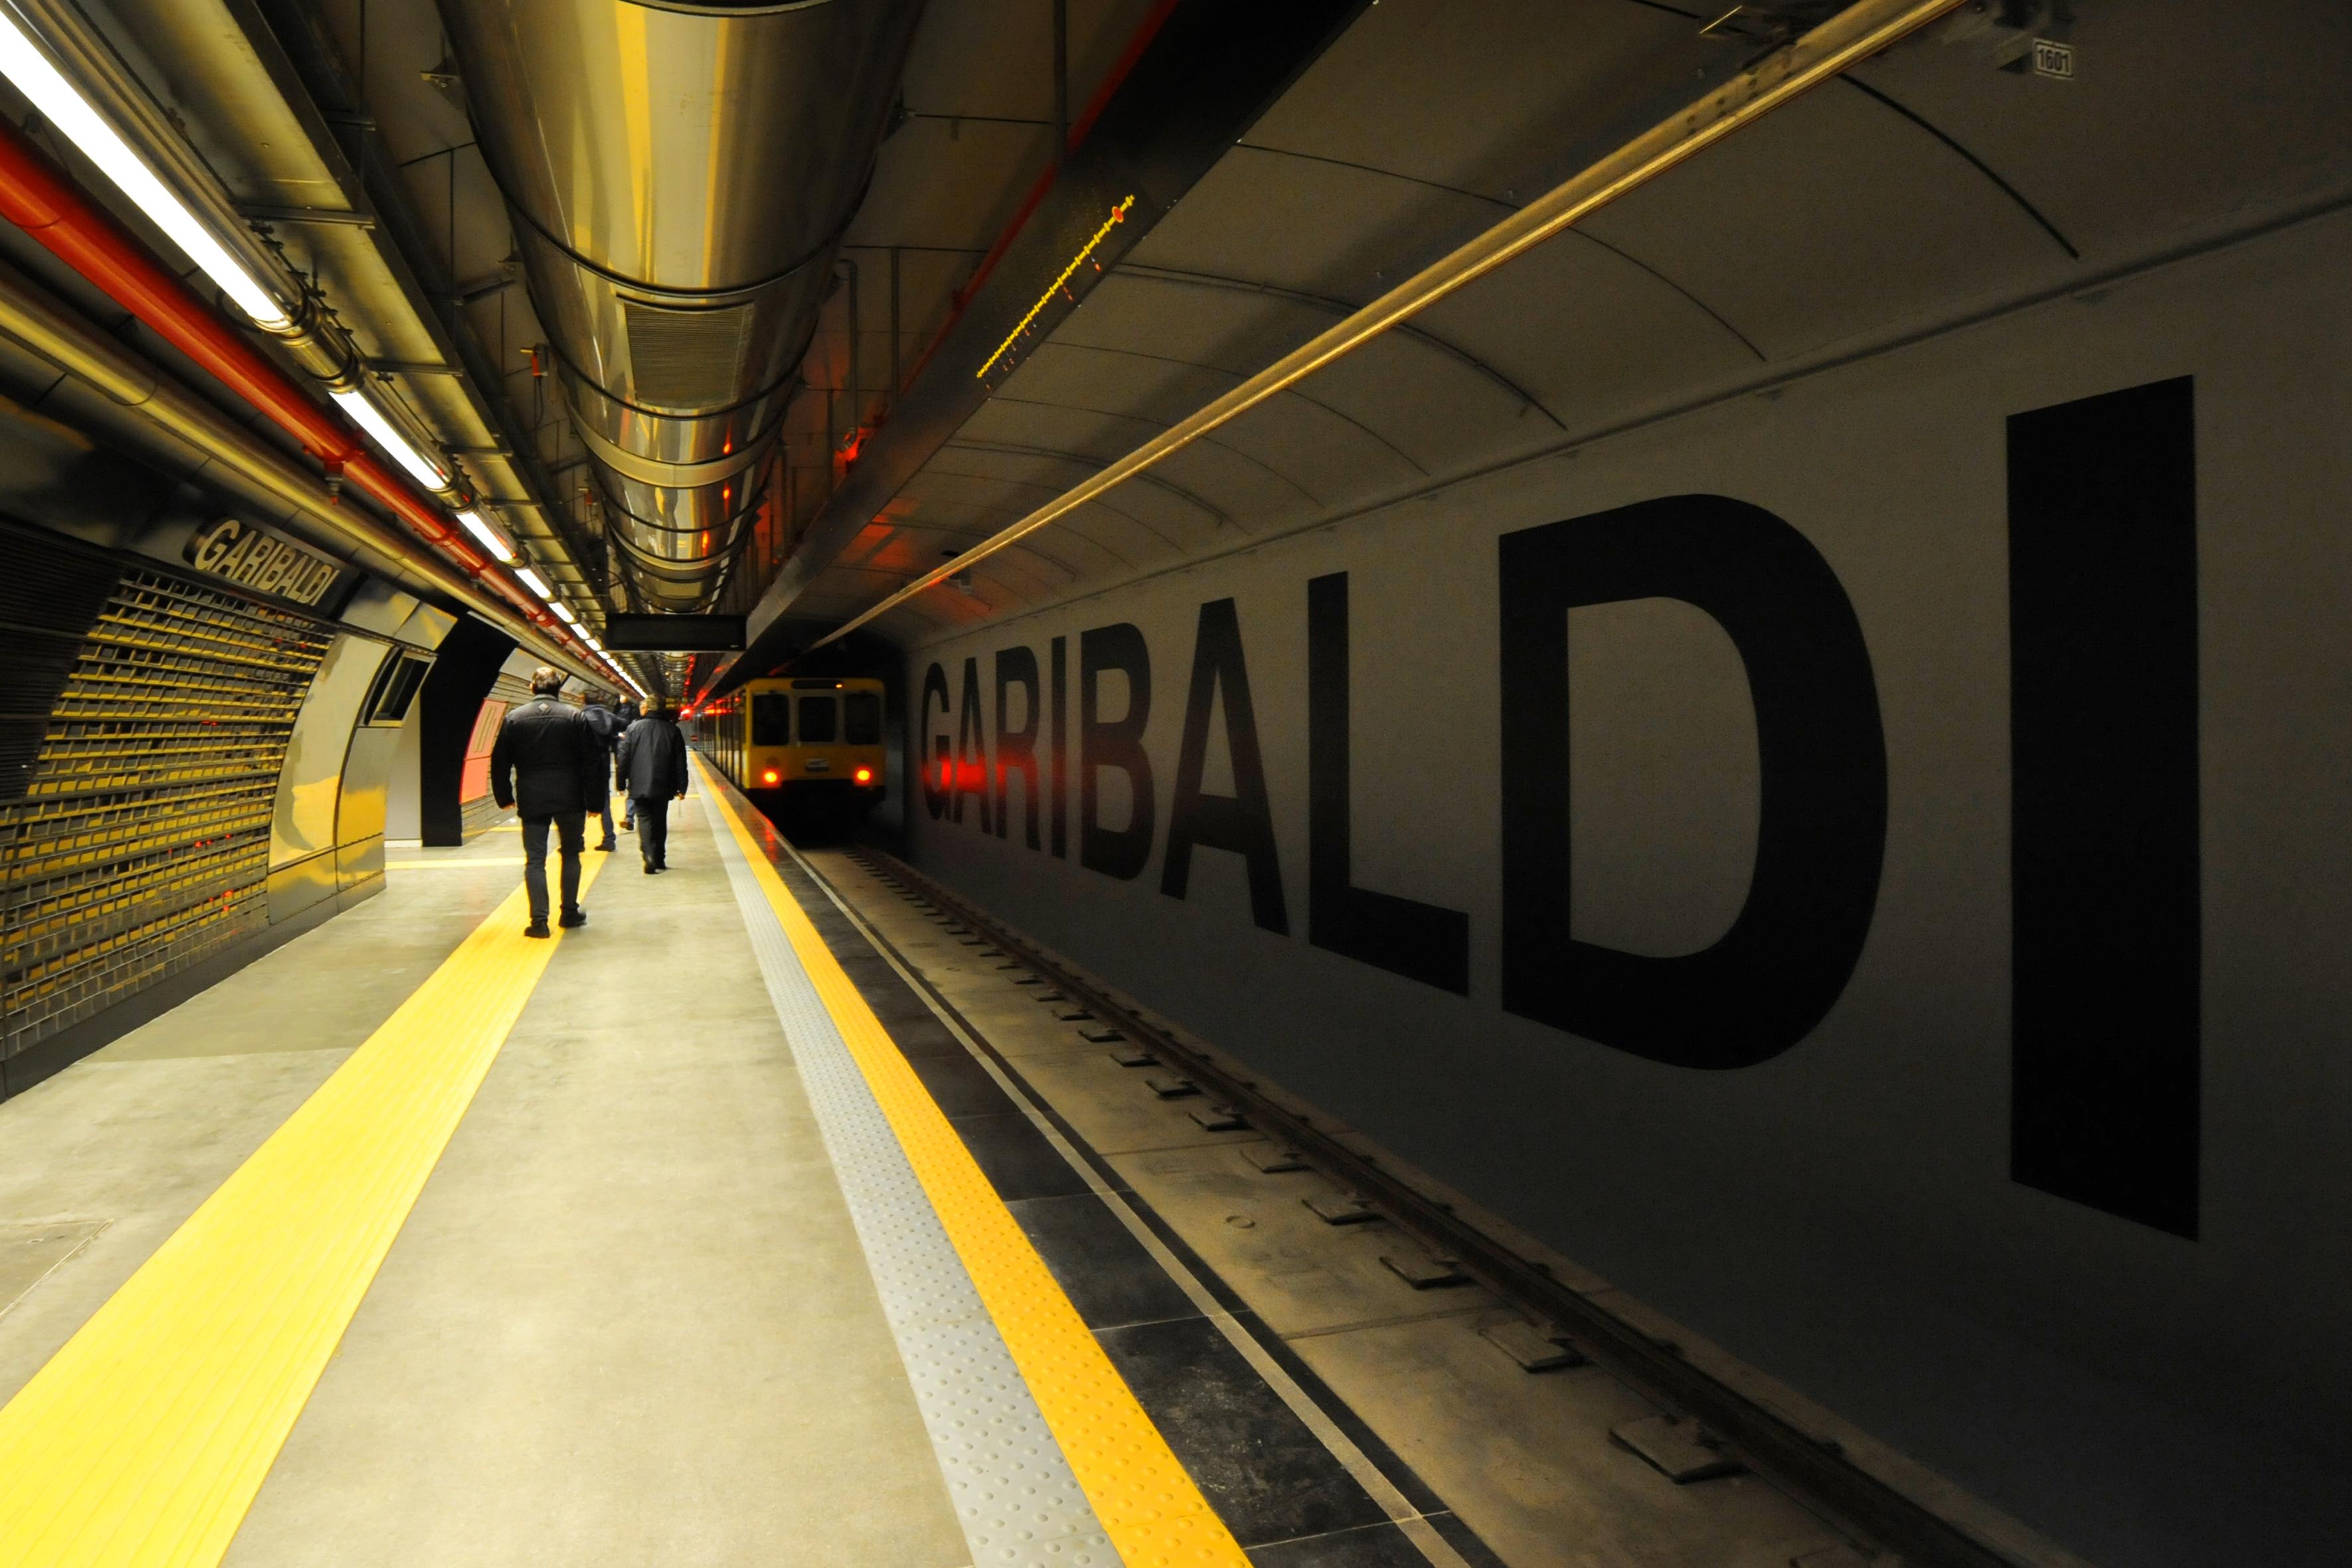 suicidio in metropolitana